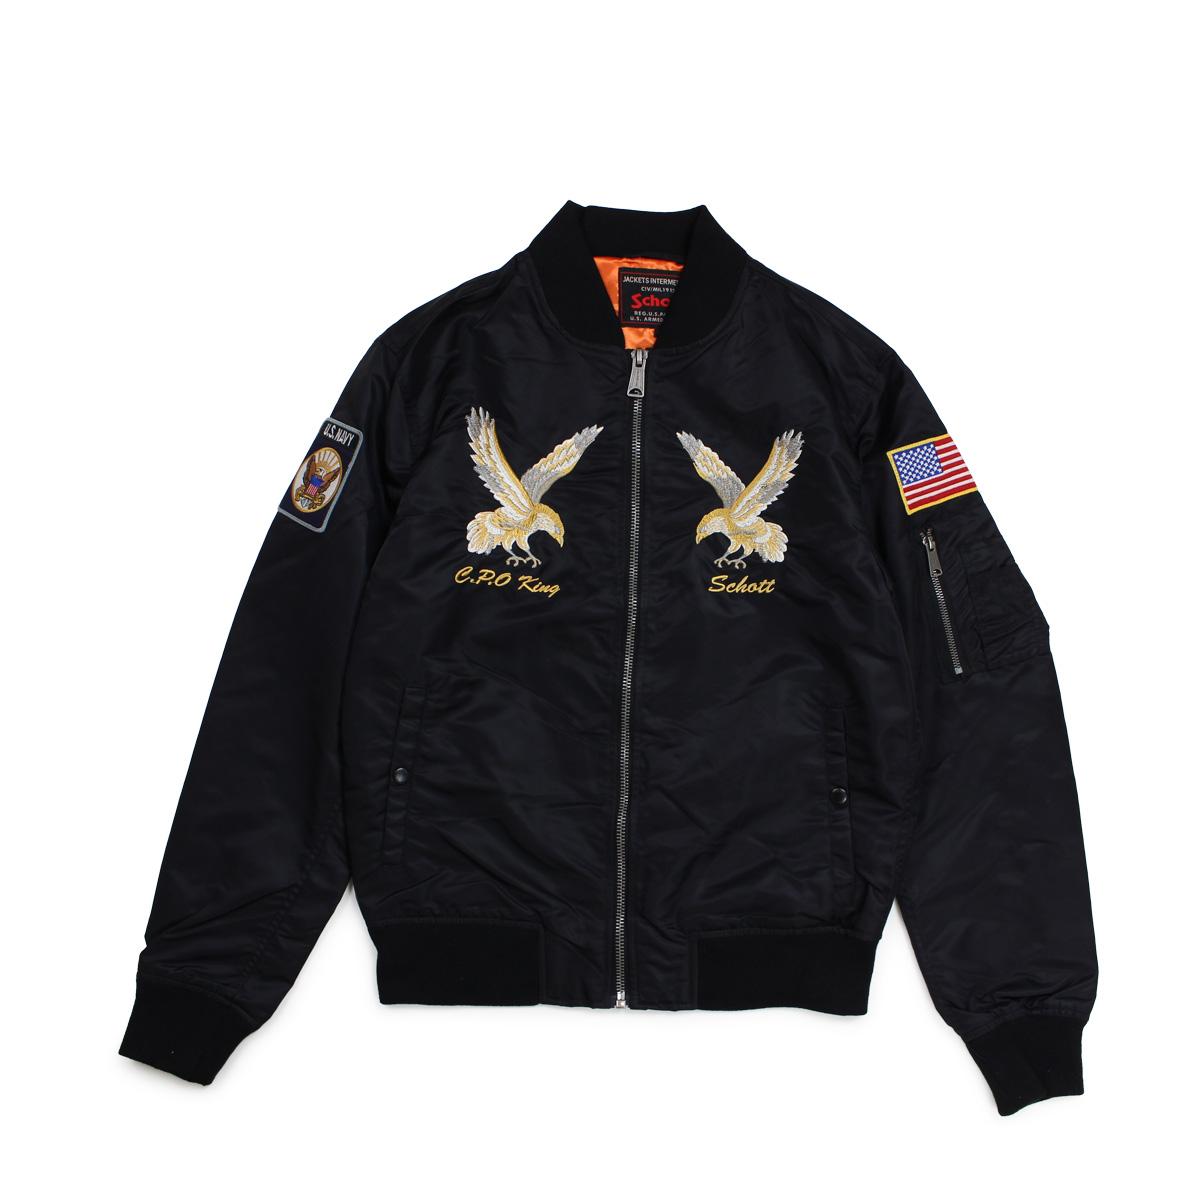 Schott NYLON MA-1 FlIGHT JACKET ショット ジャケット MA1 ナイロンジャケット メンズ ブラック 9722